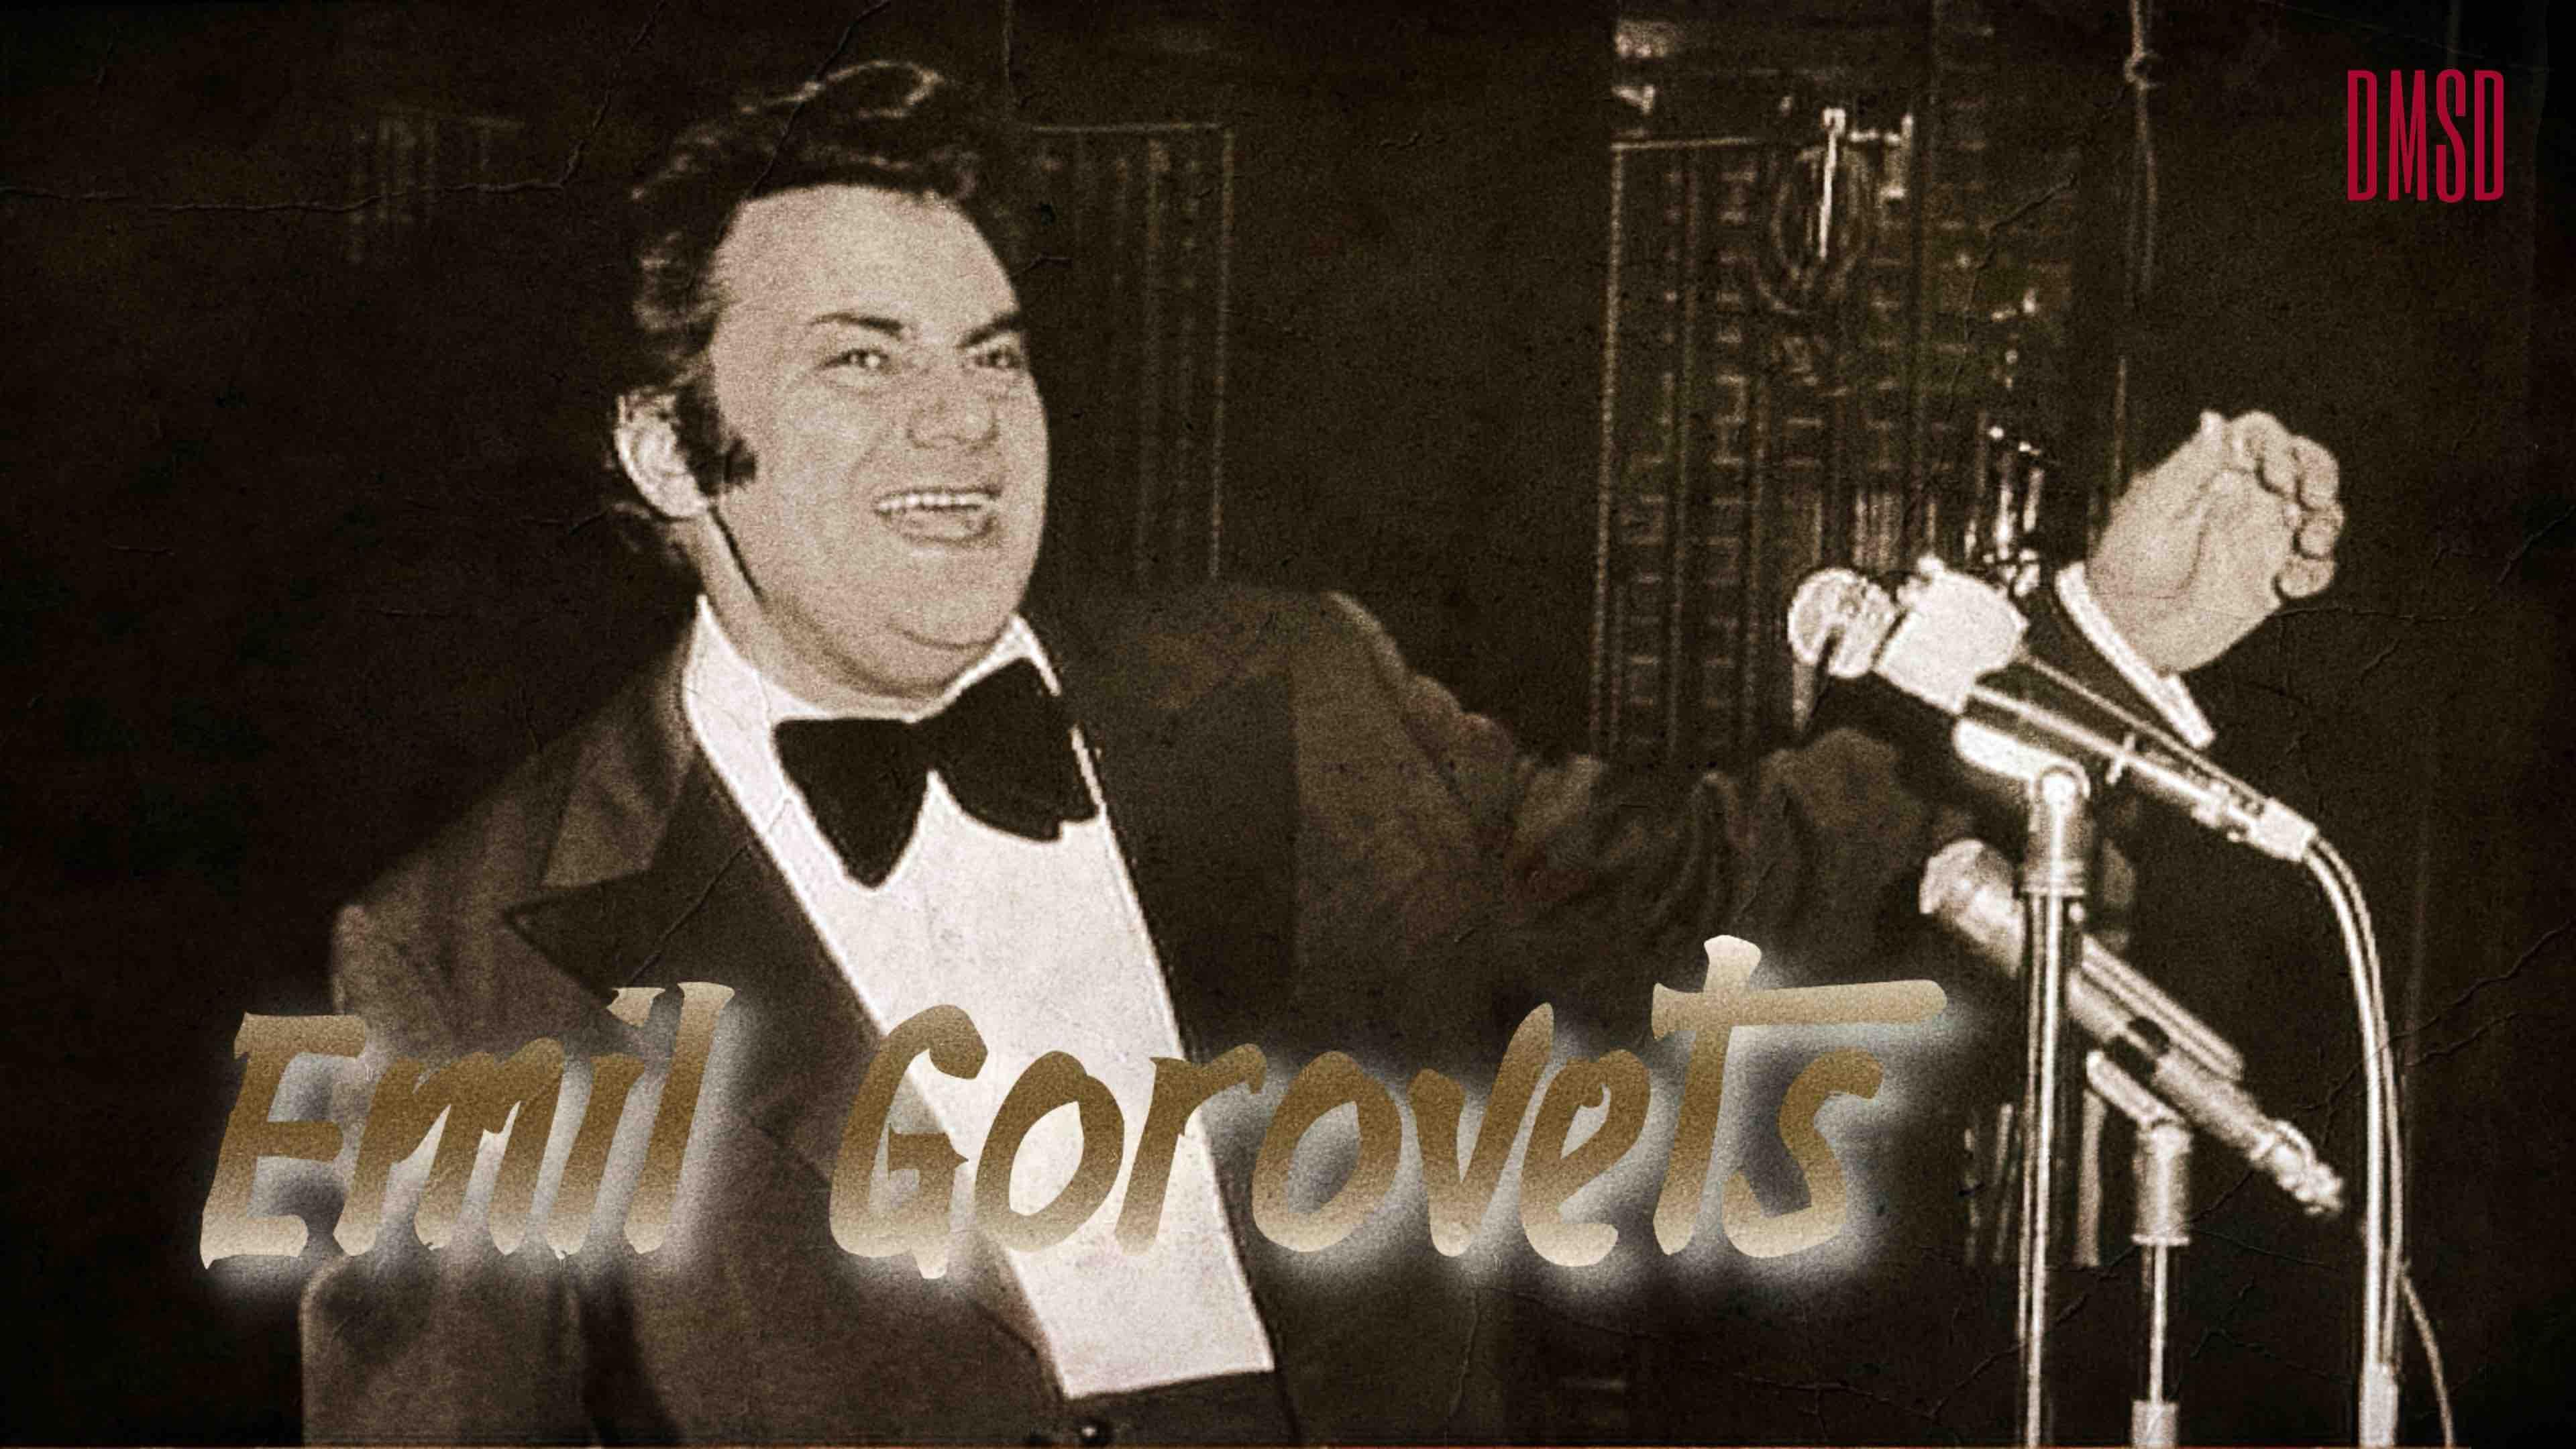 Emil Gorovets. Dilogy [2014]